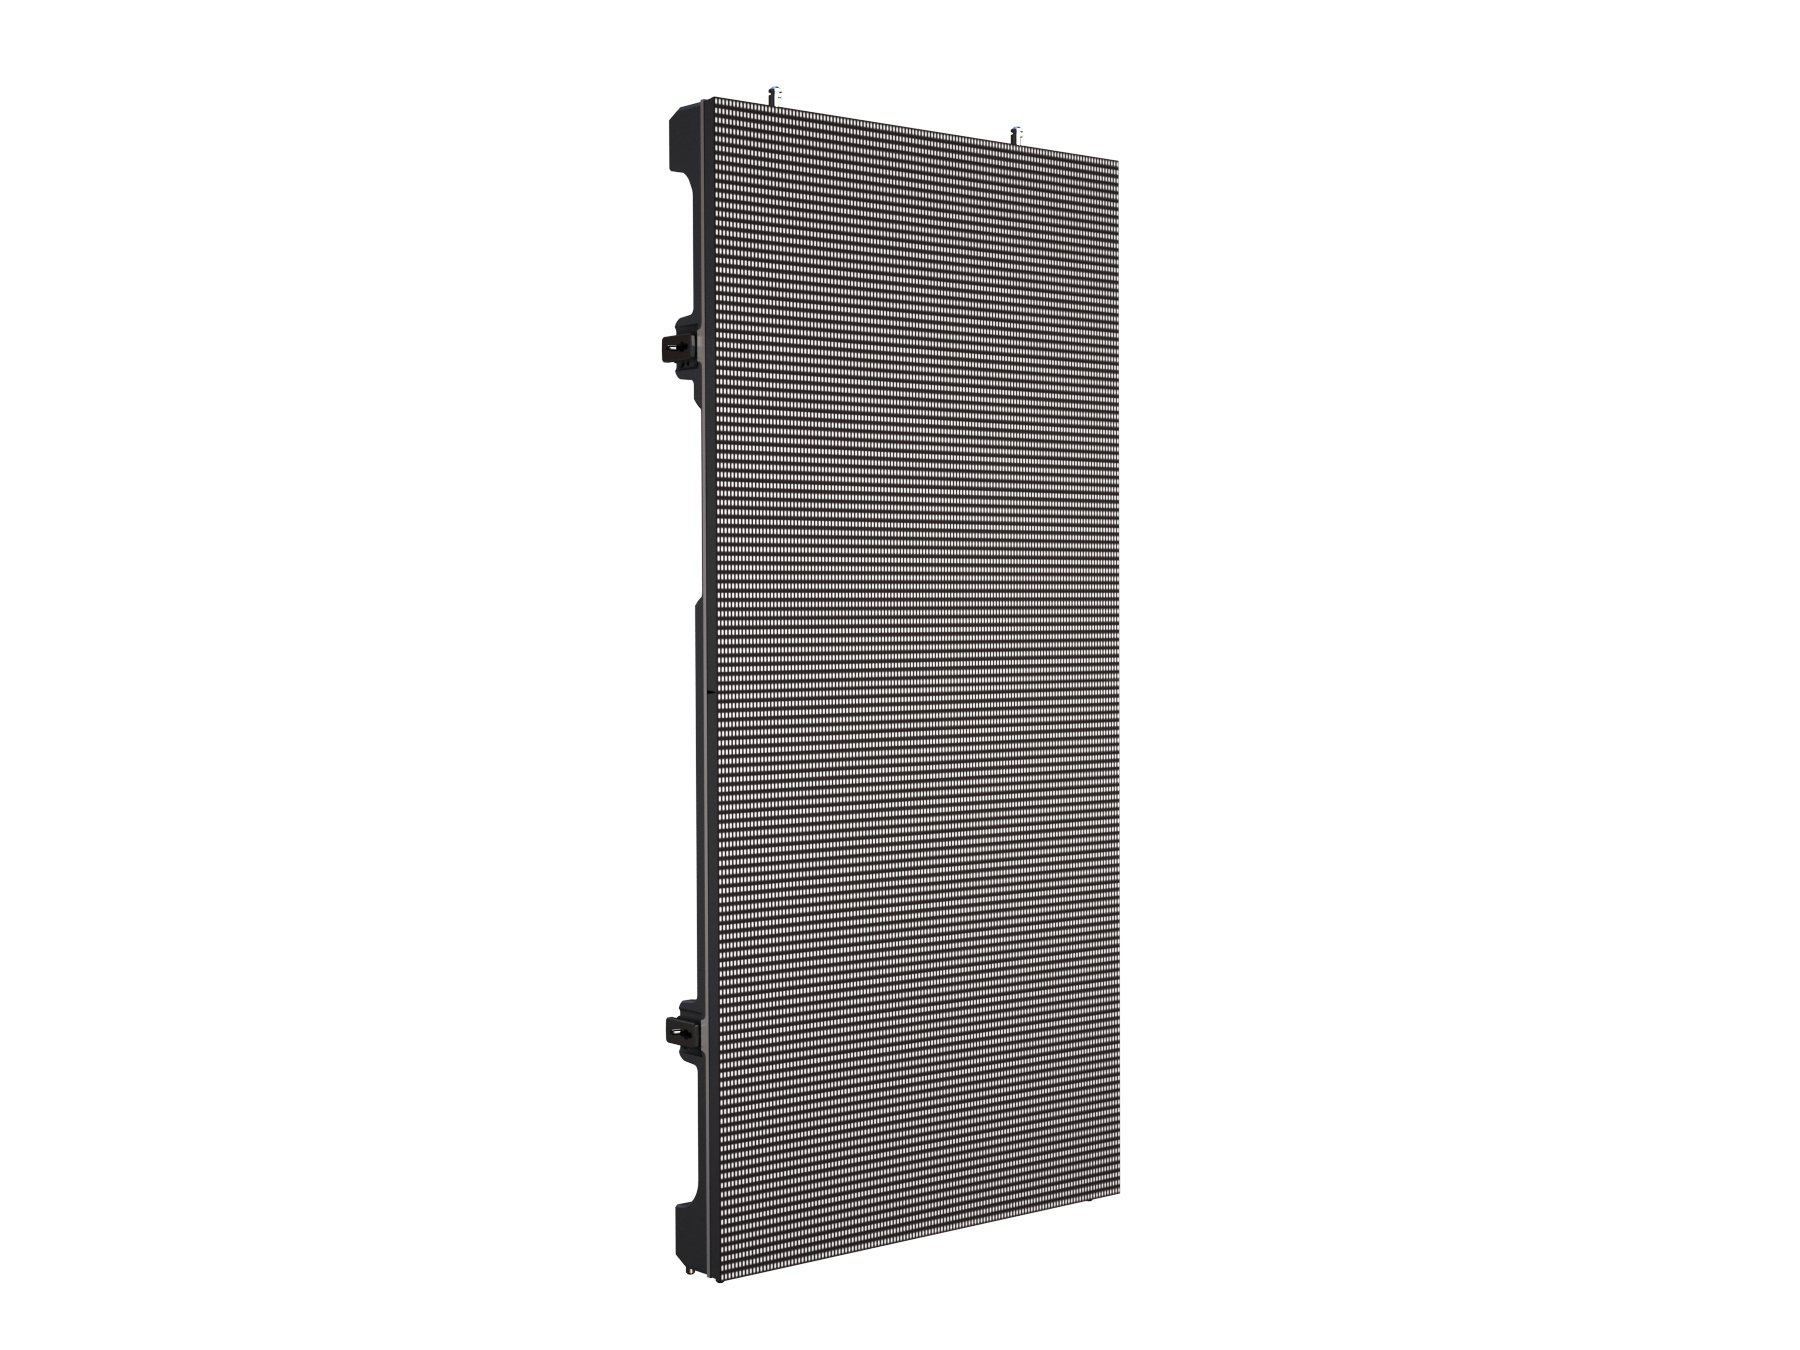 ULS rental LED virtual production 500x1000 angle 3